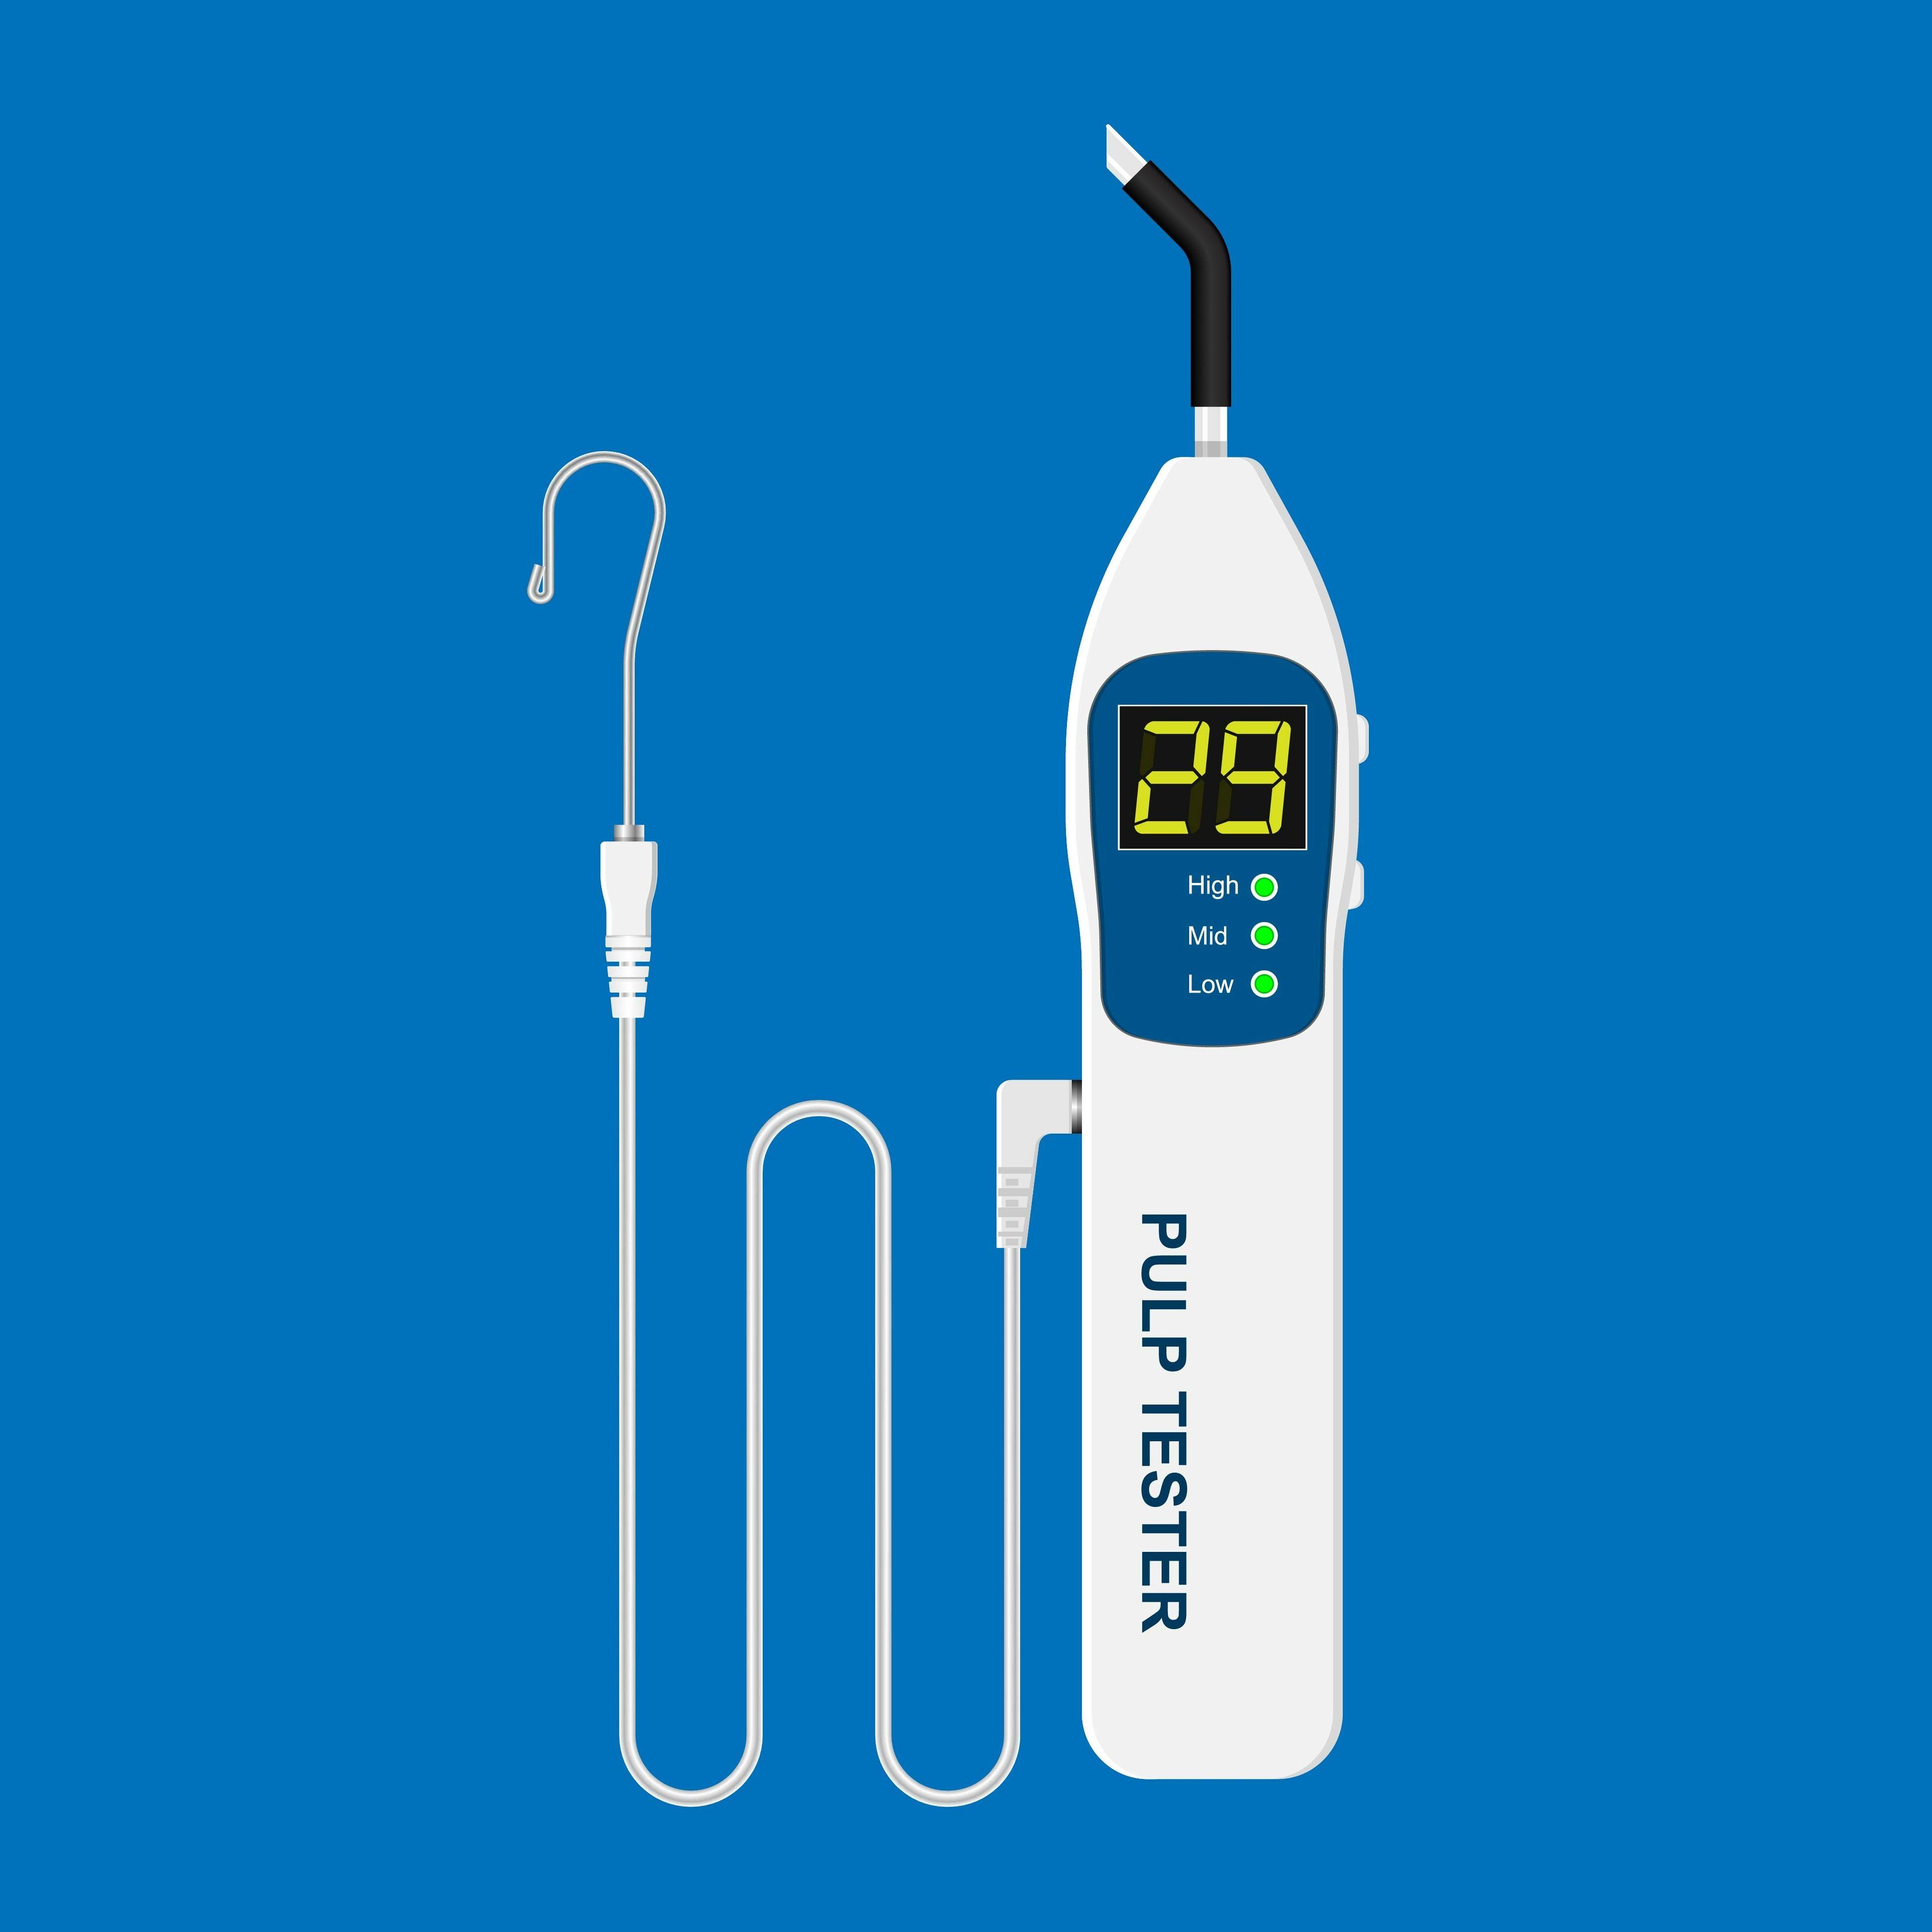 Pulp vitality testing rumruay / stock.adobe.com